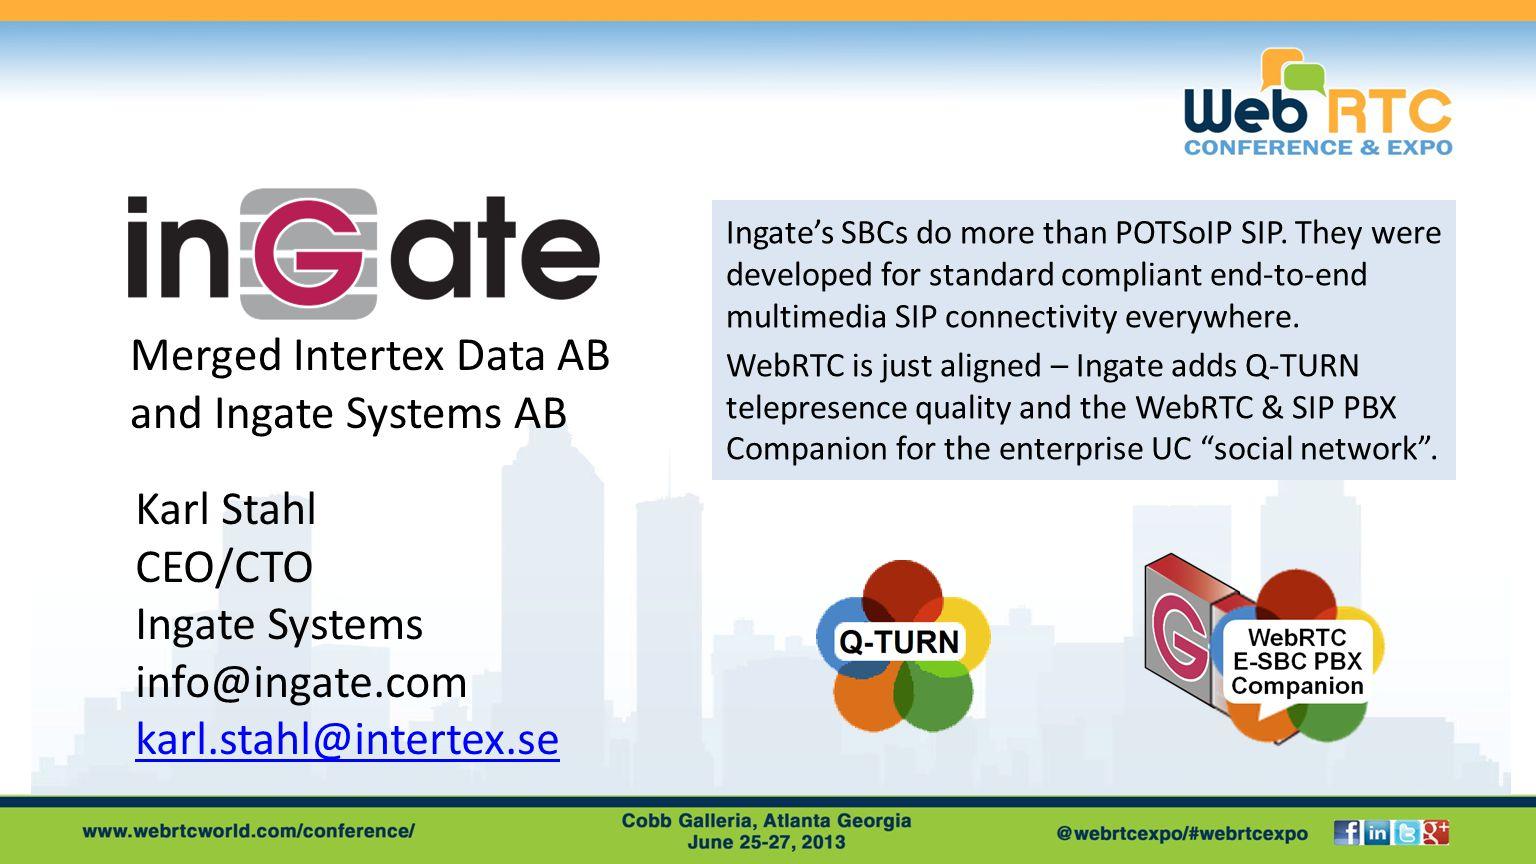 Karl Stahl CEO/CTO Ingate Systems info@ingate.com karl.stahl@intertex.se karl.stahl@intertex.se Ingate's SBCs do more than POTSoIP SIP.